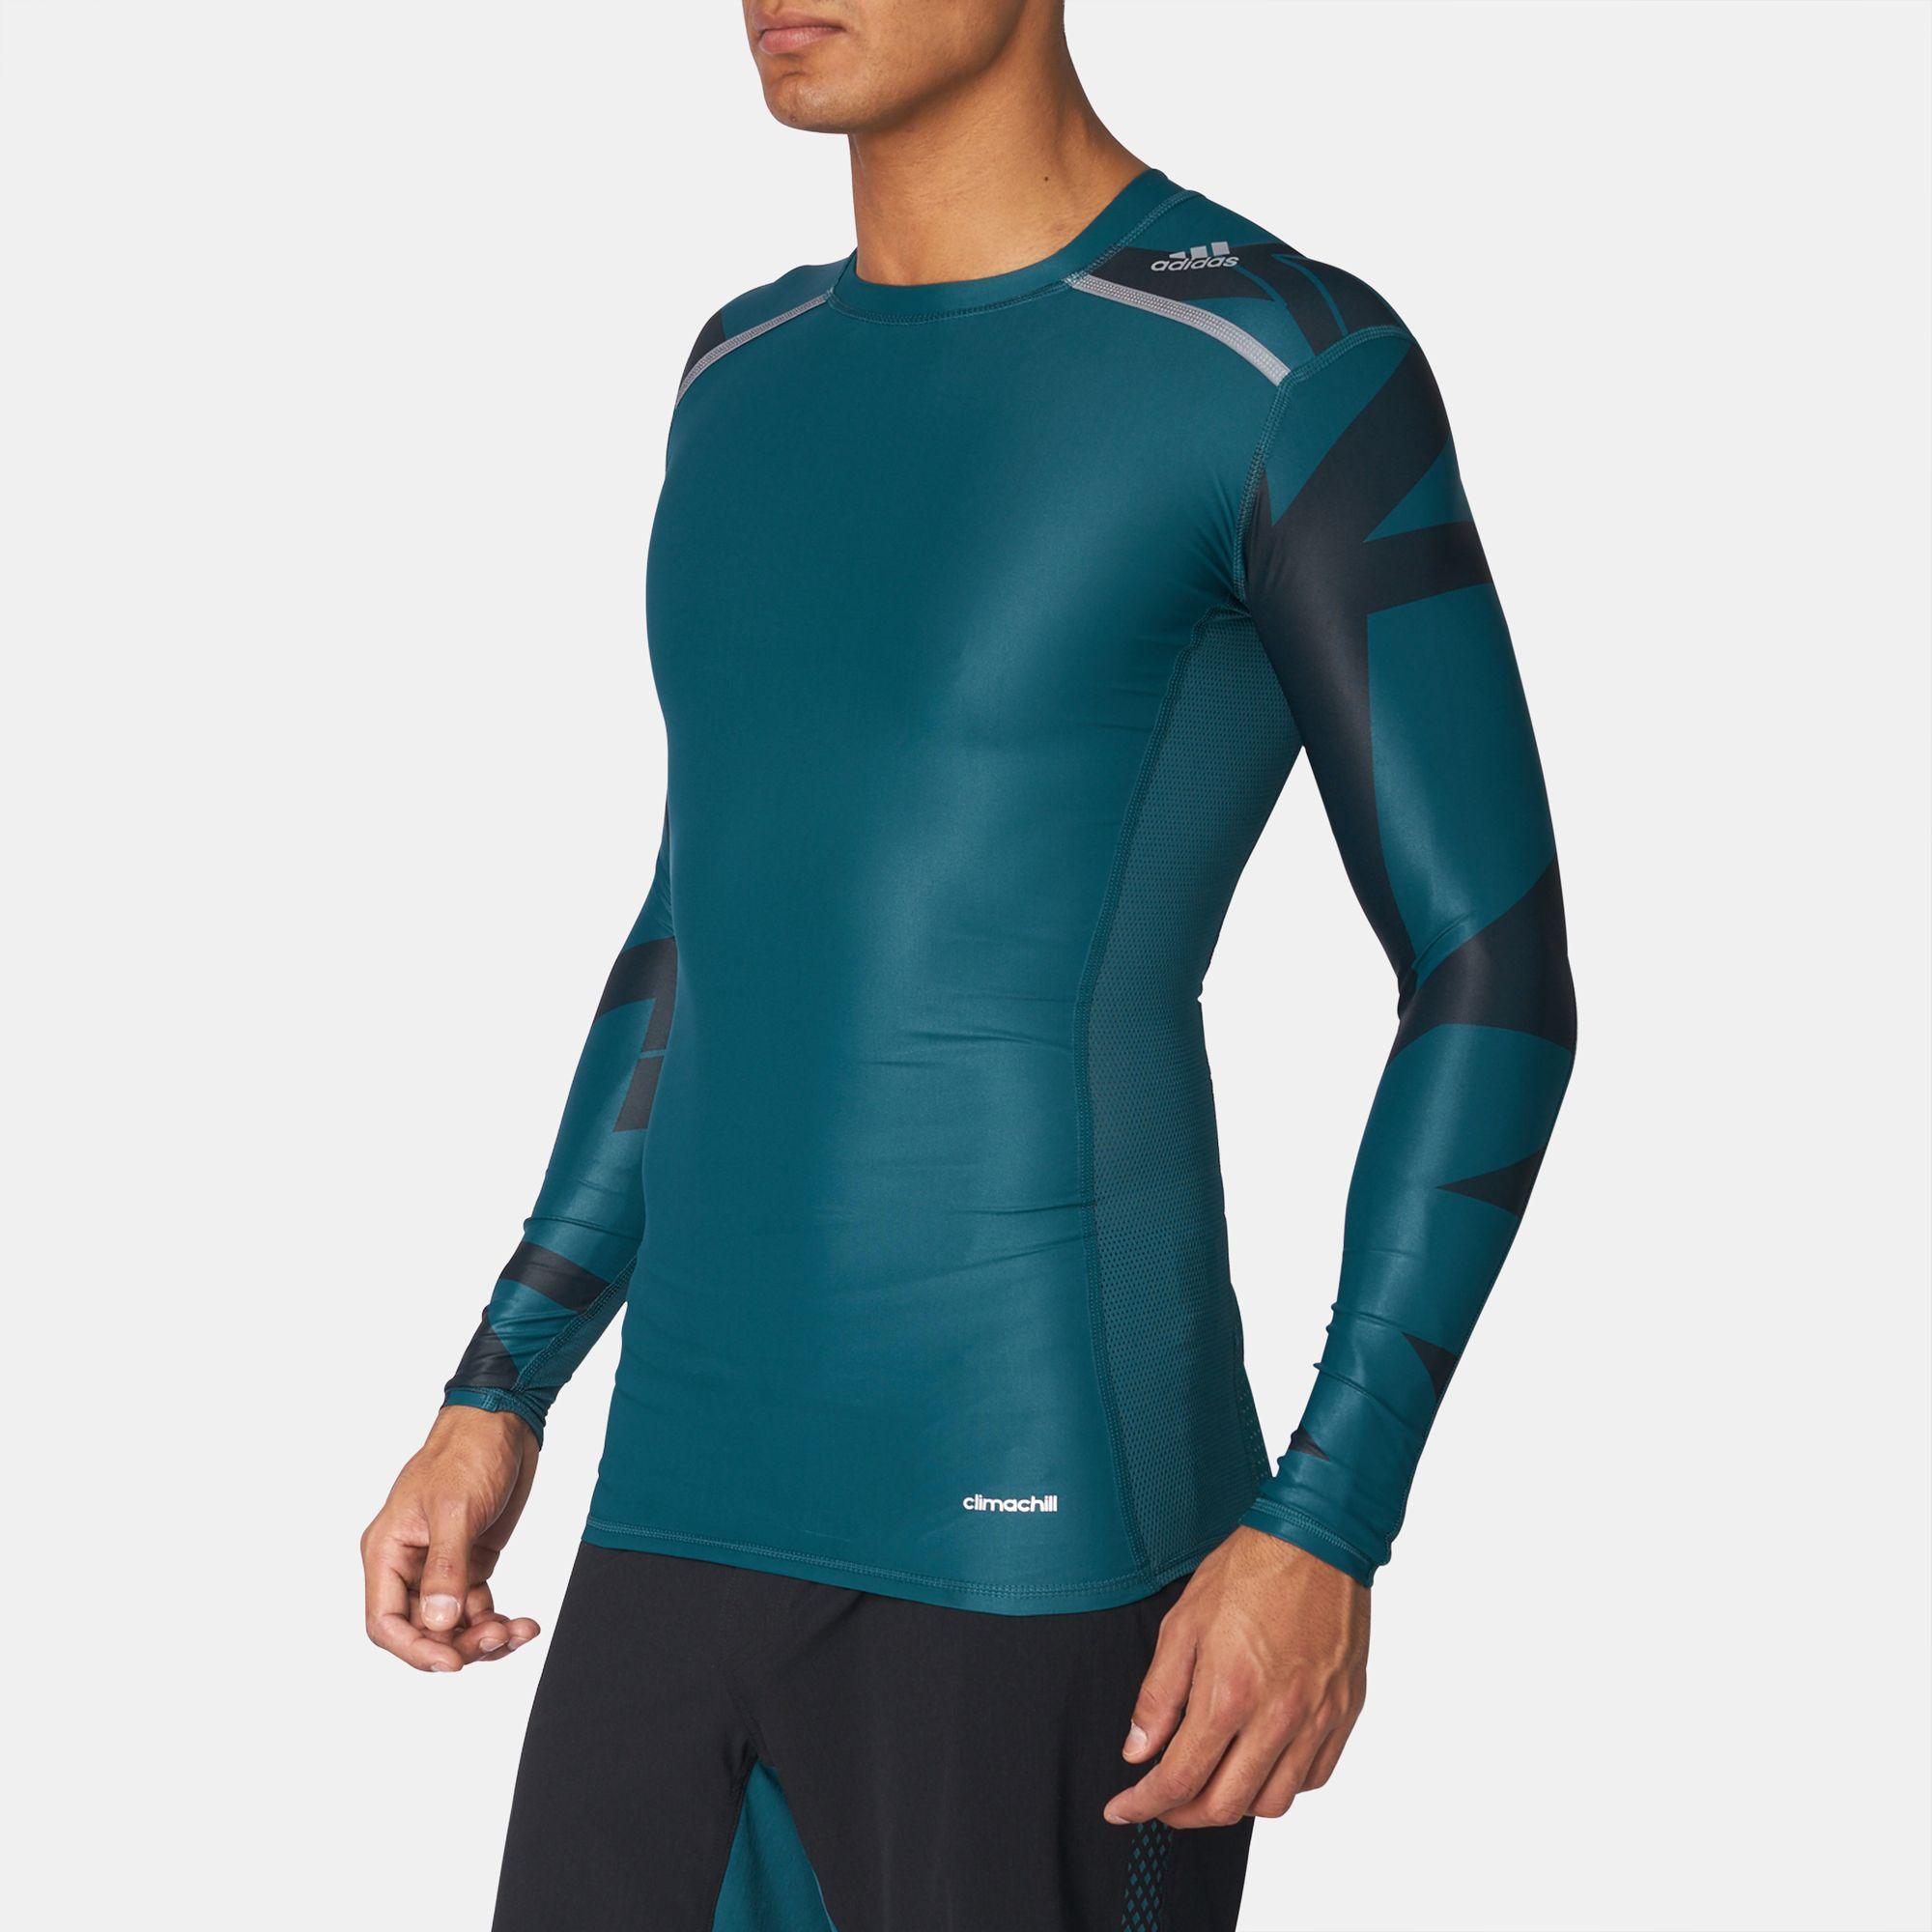 Adidas Techfit Freddo Gfx Manica Lunga T - Massimo Shirt T Shirt Al Massimo - eb15e0